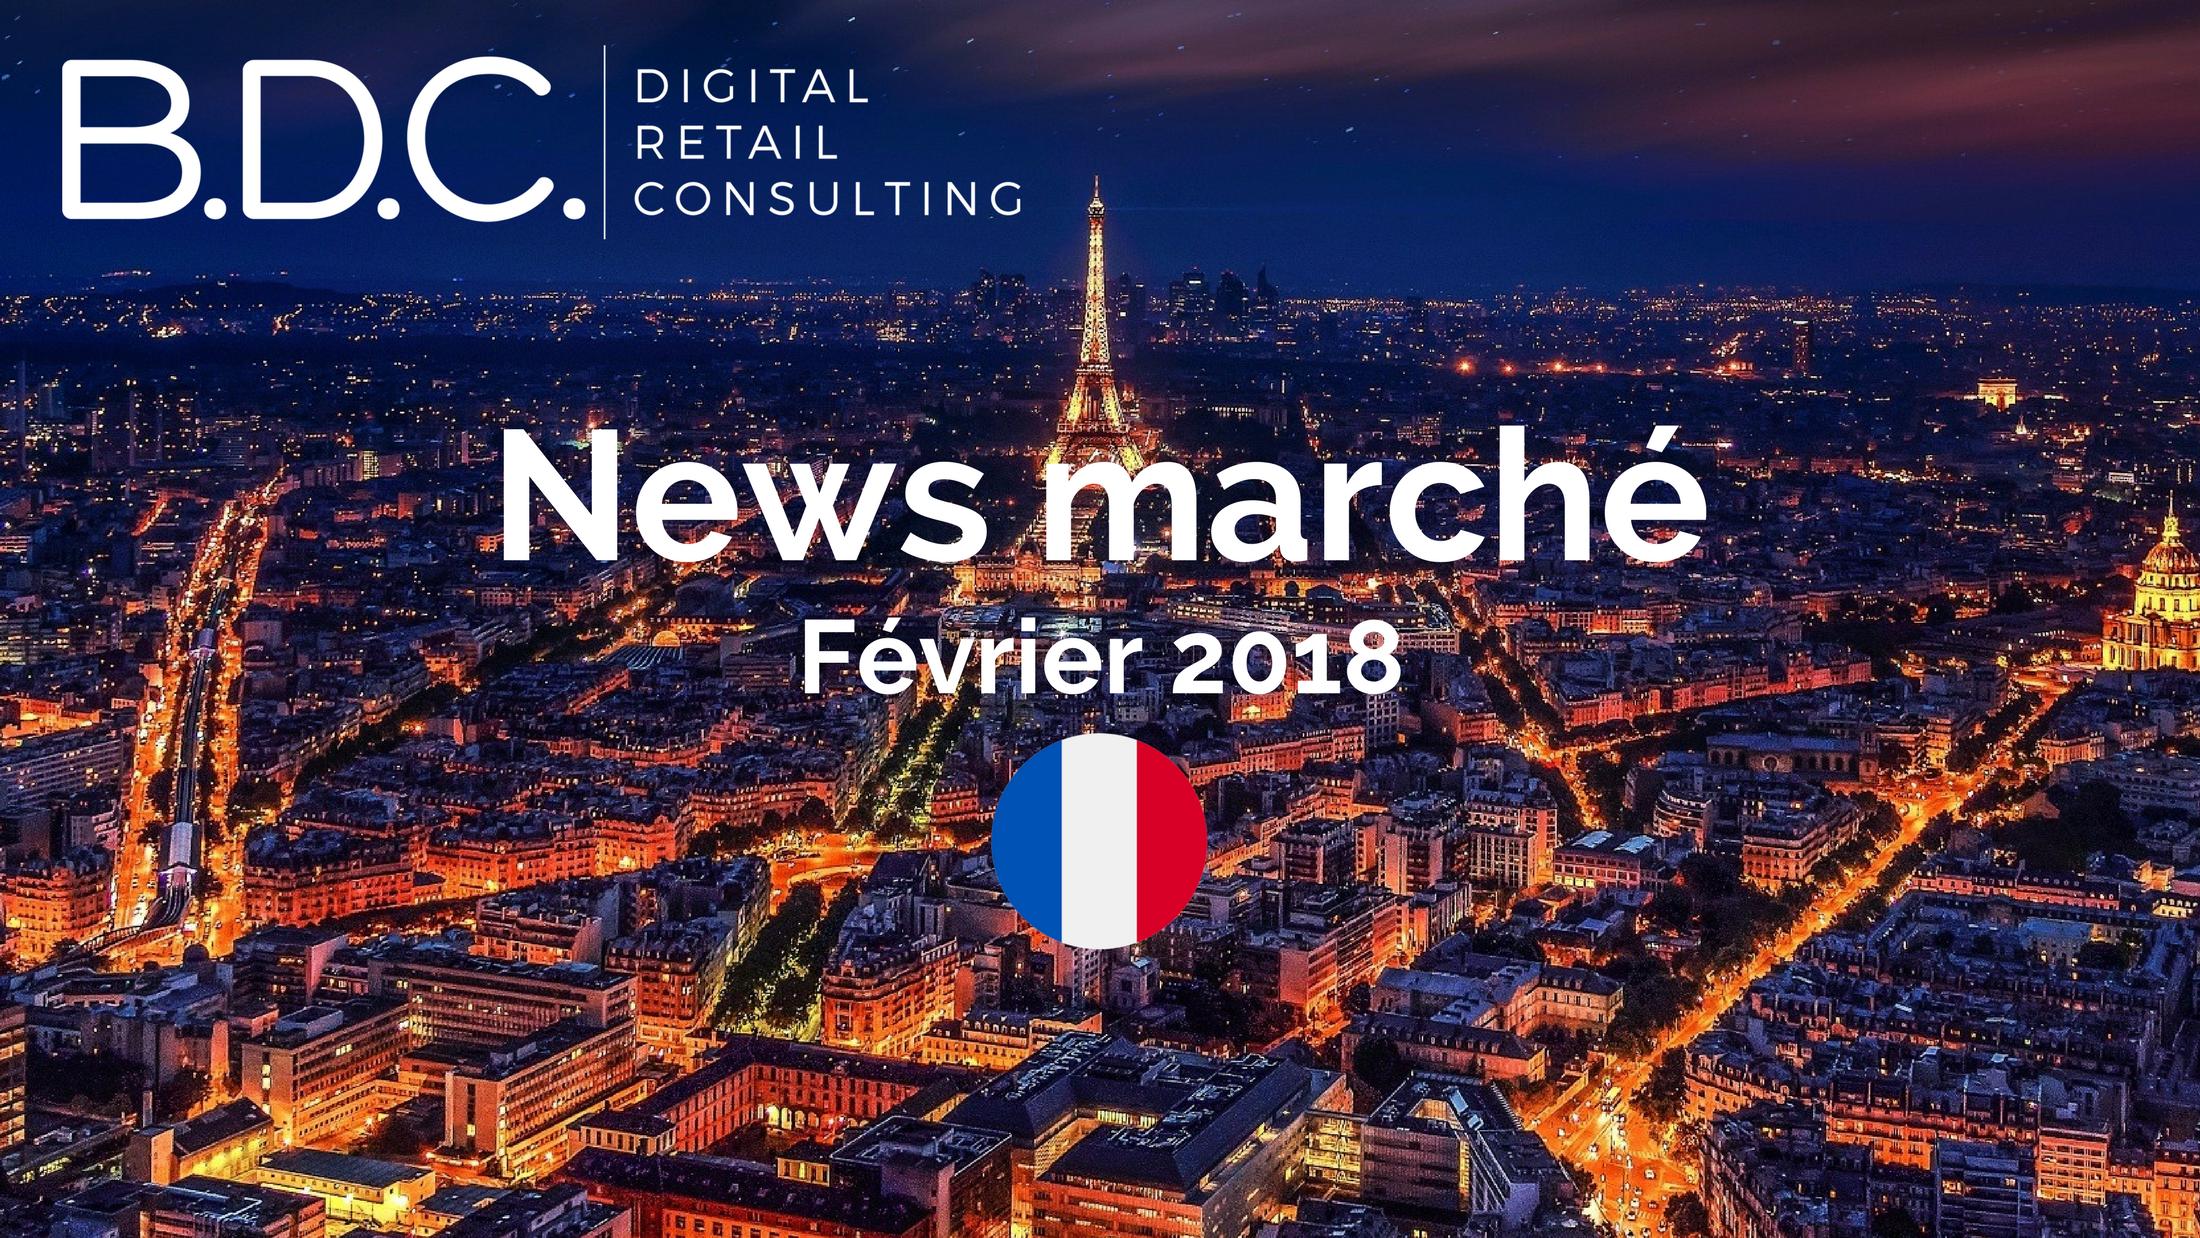 Trends News 1 - News marché - Février 2018